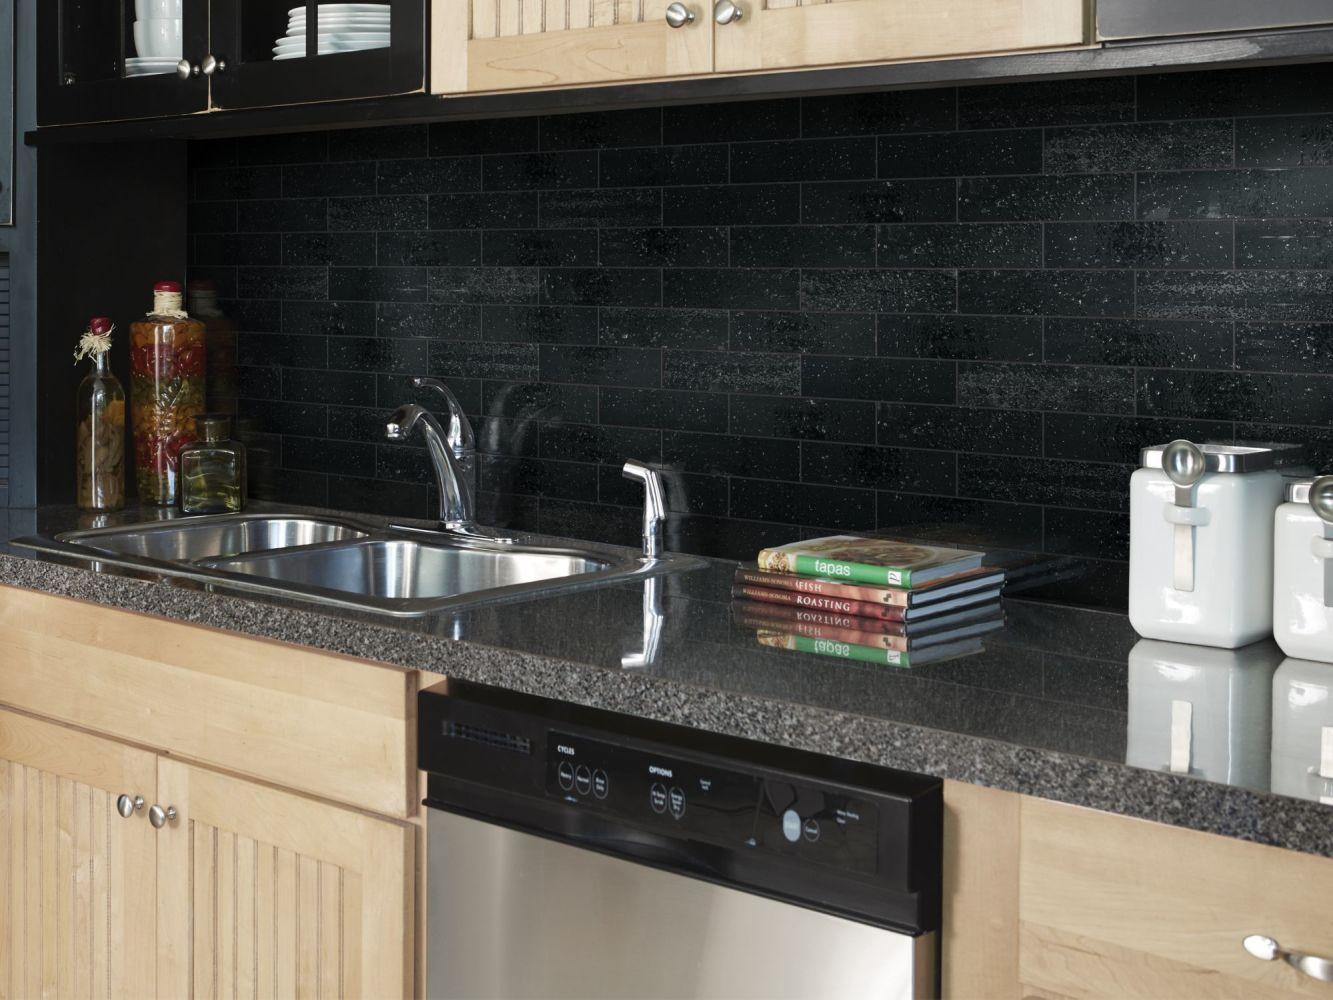 Shaw Floors Ceramic Solutions Geoscapes Brick Black 00555_194TS